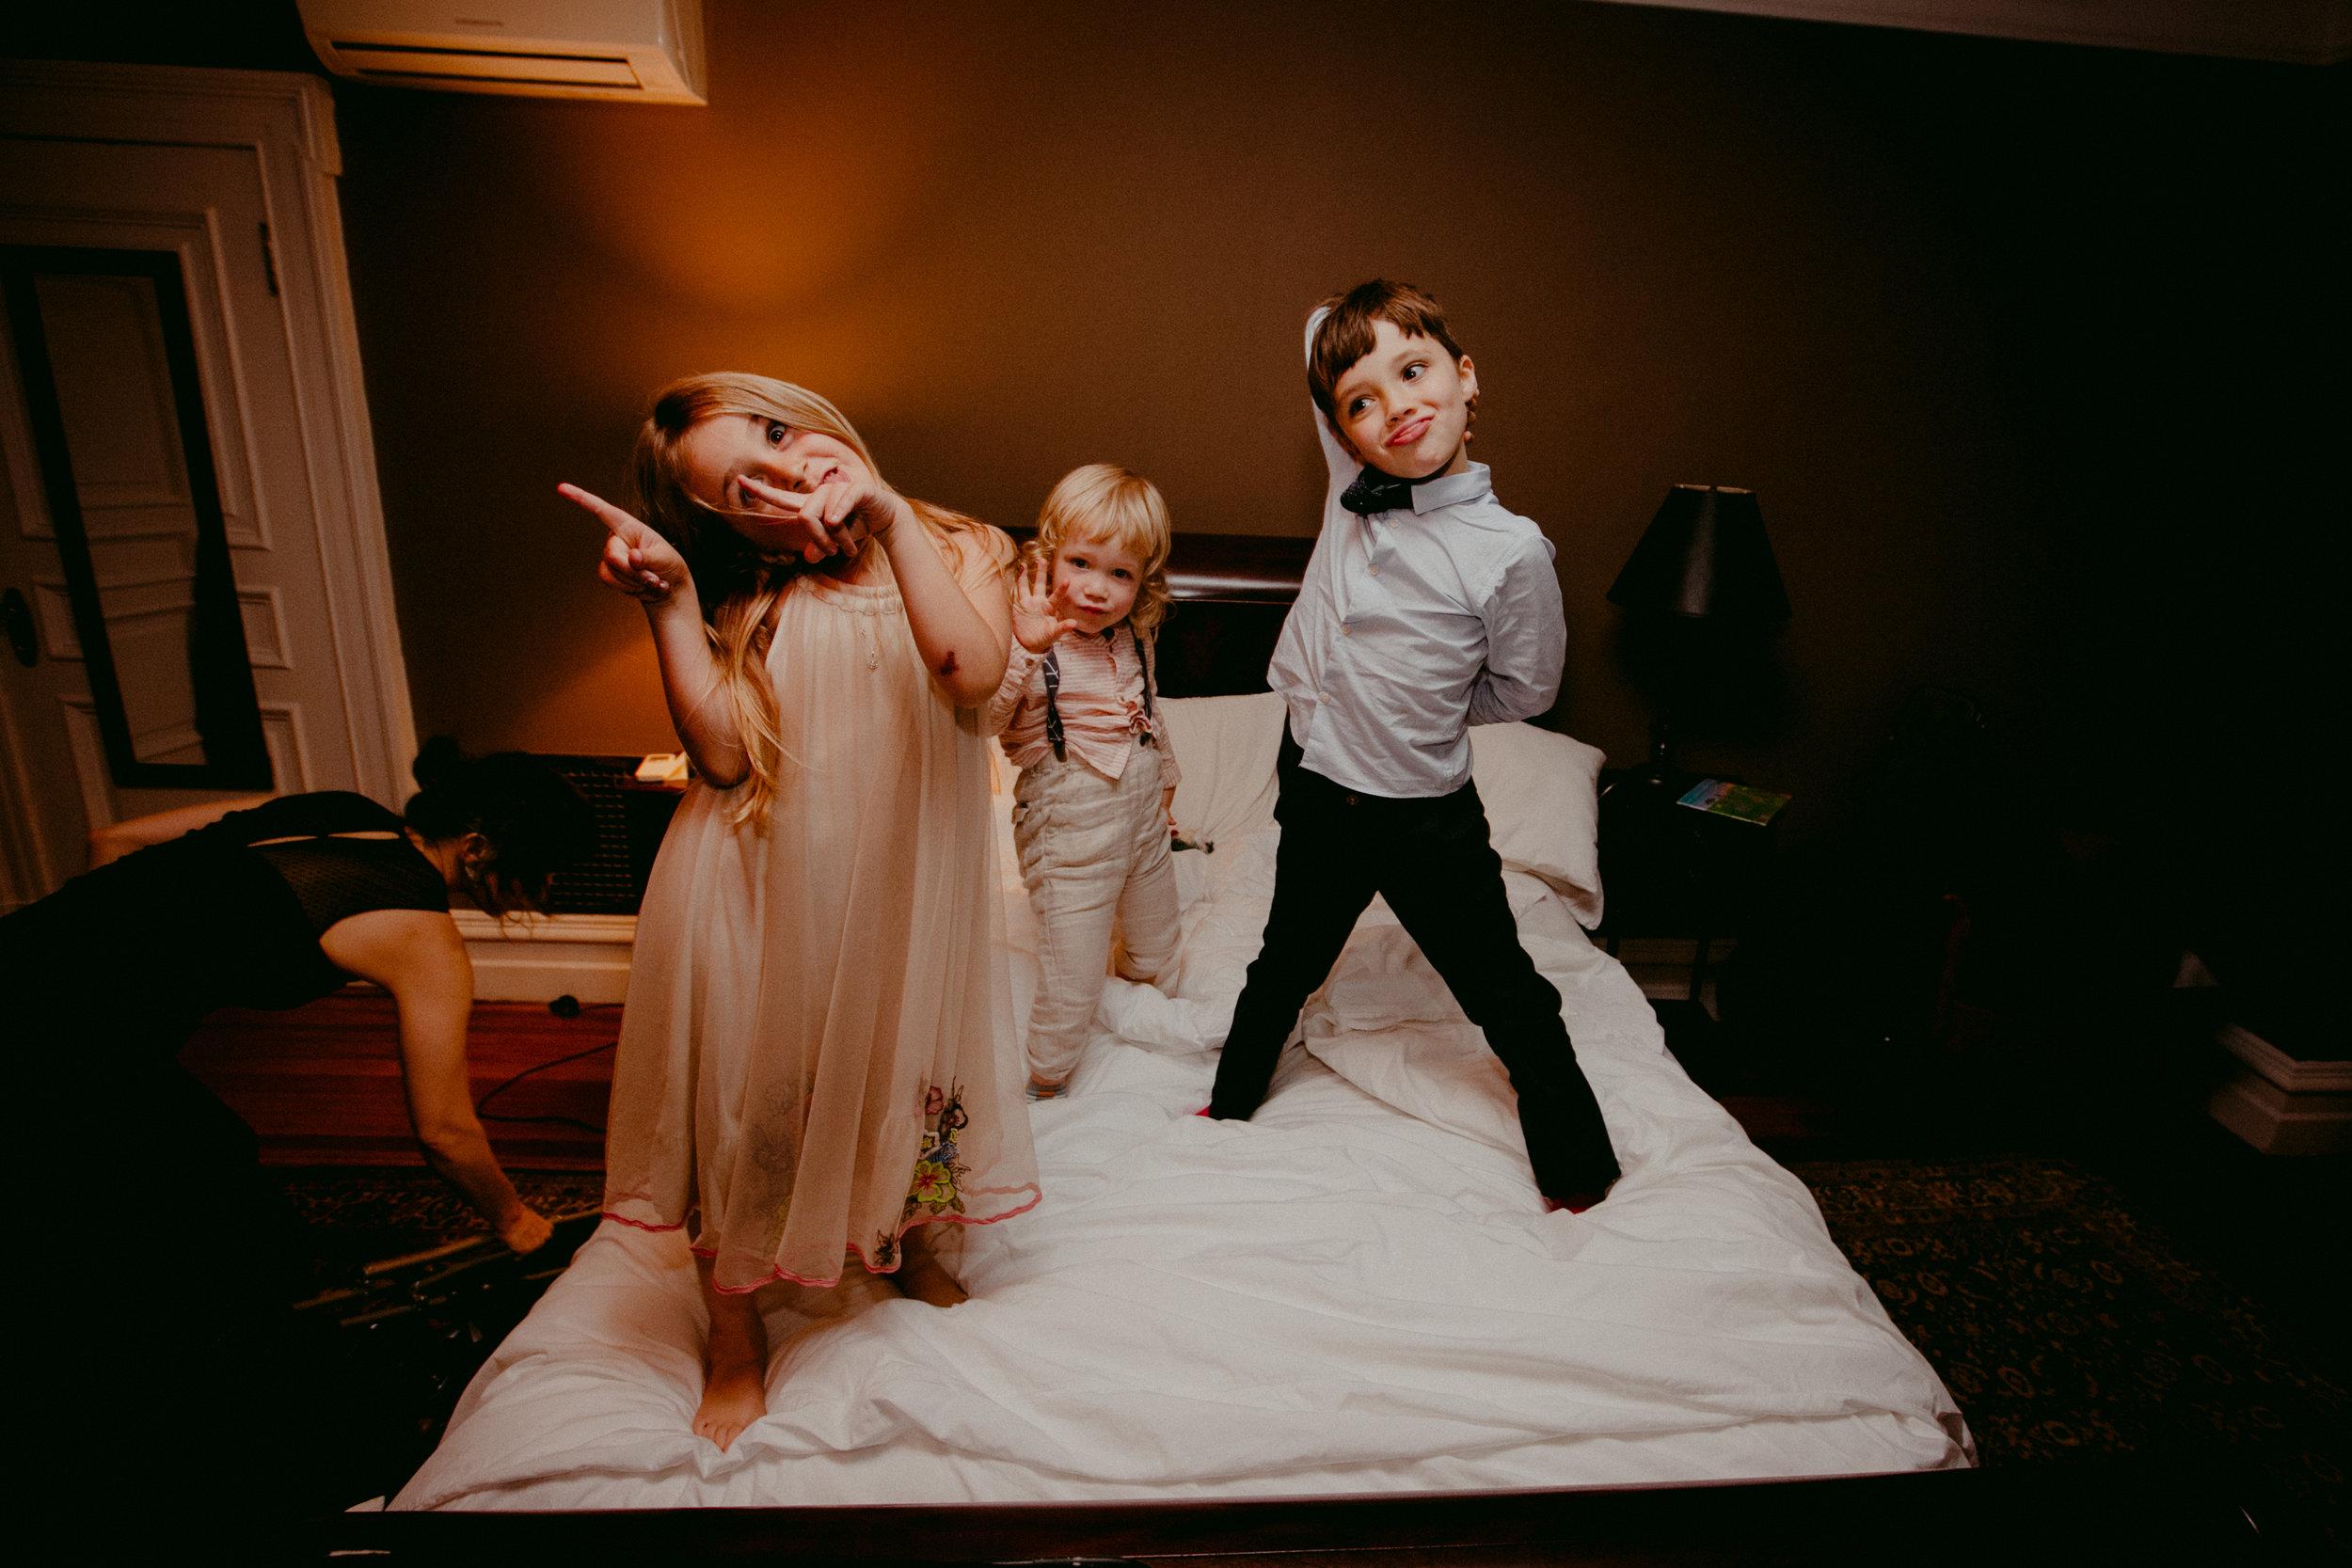 Tiger_House_The_Inn_at_Hudson-Wedding_Chellise_Michael_Photography-566.jpg